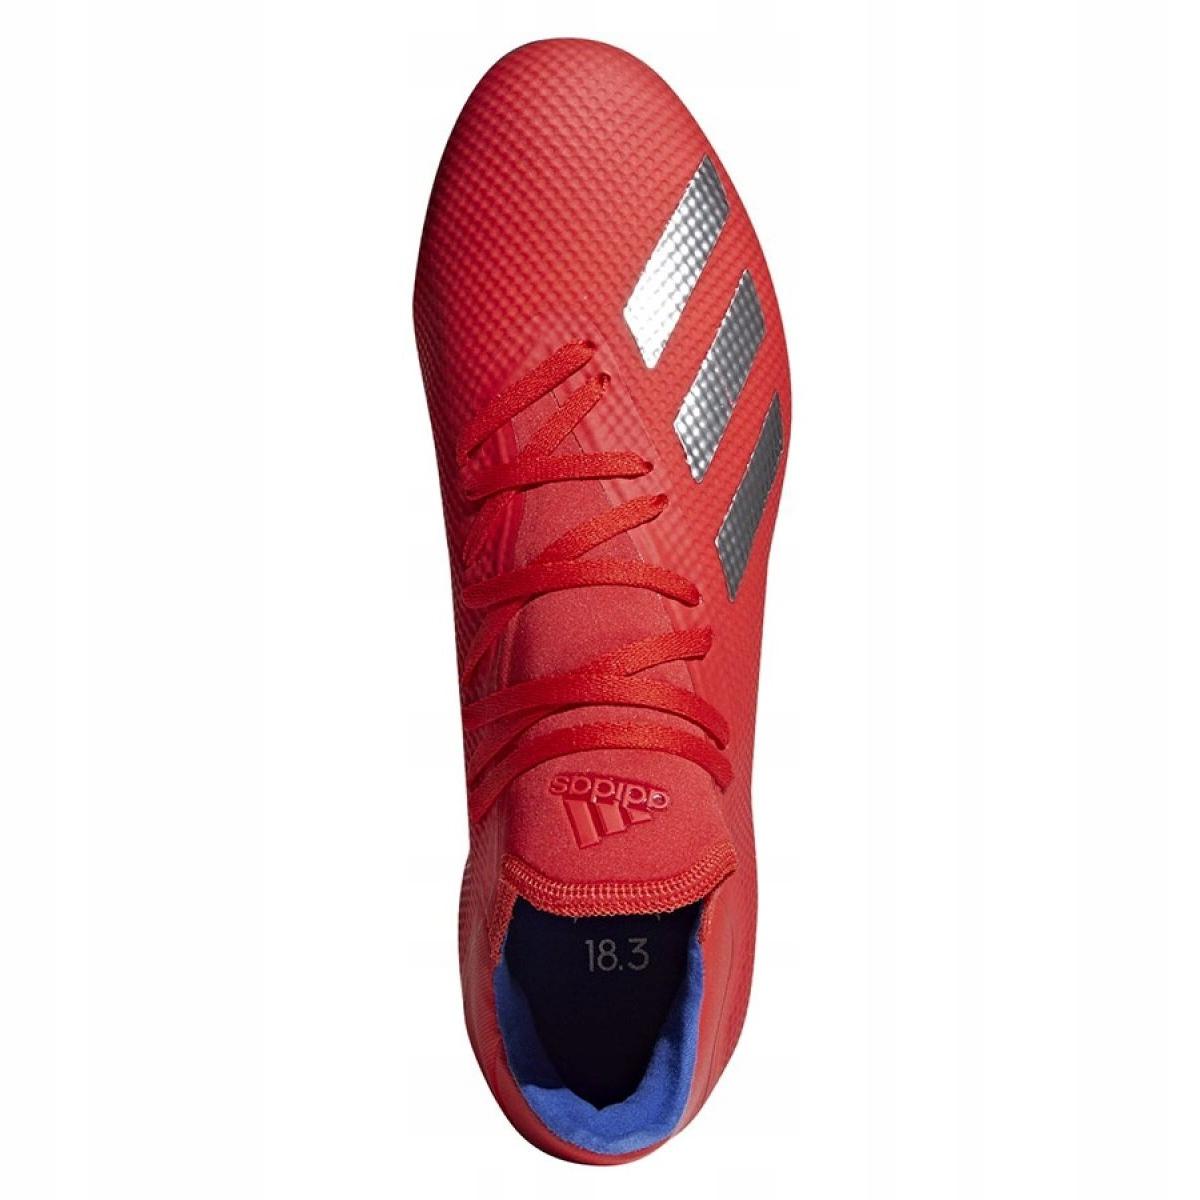 scarpe adidas x 18.3